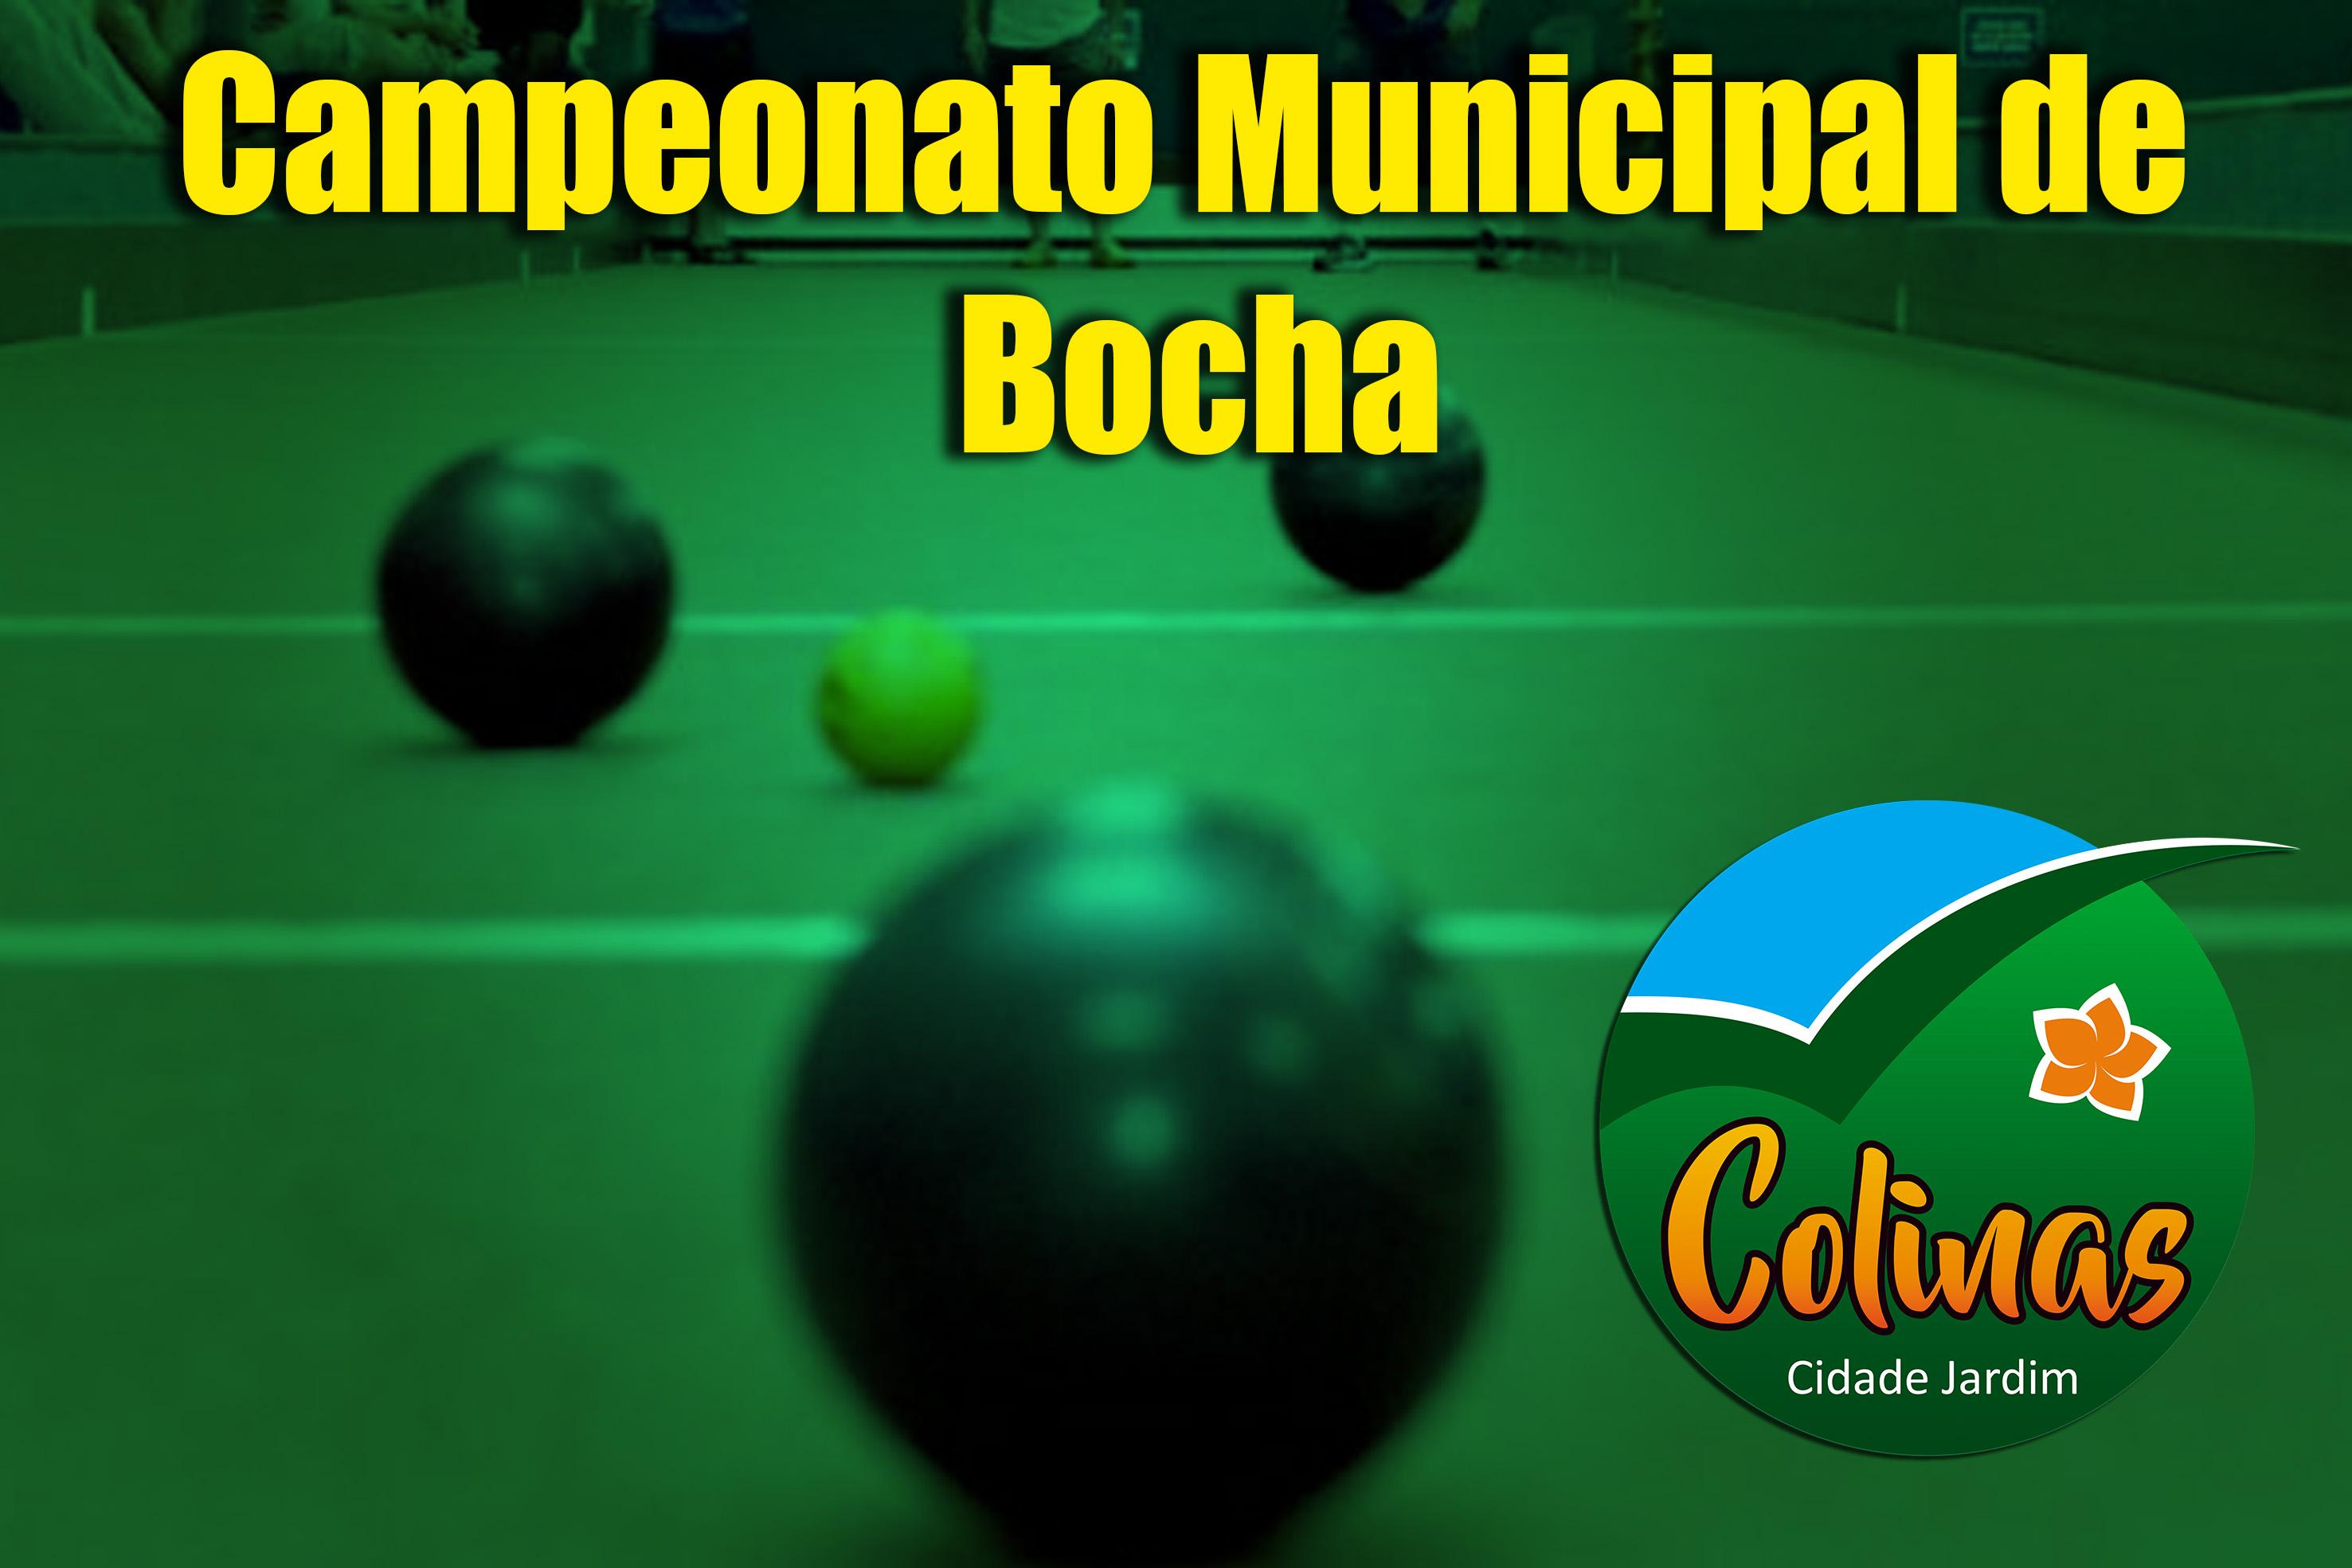 Campeonato Municipal Interbairros de Bocha começa...